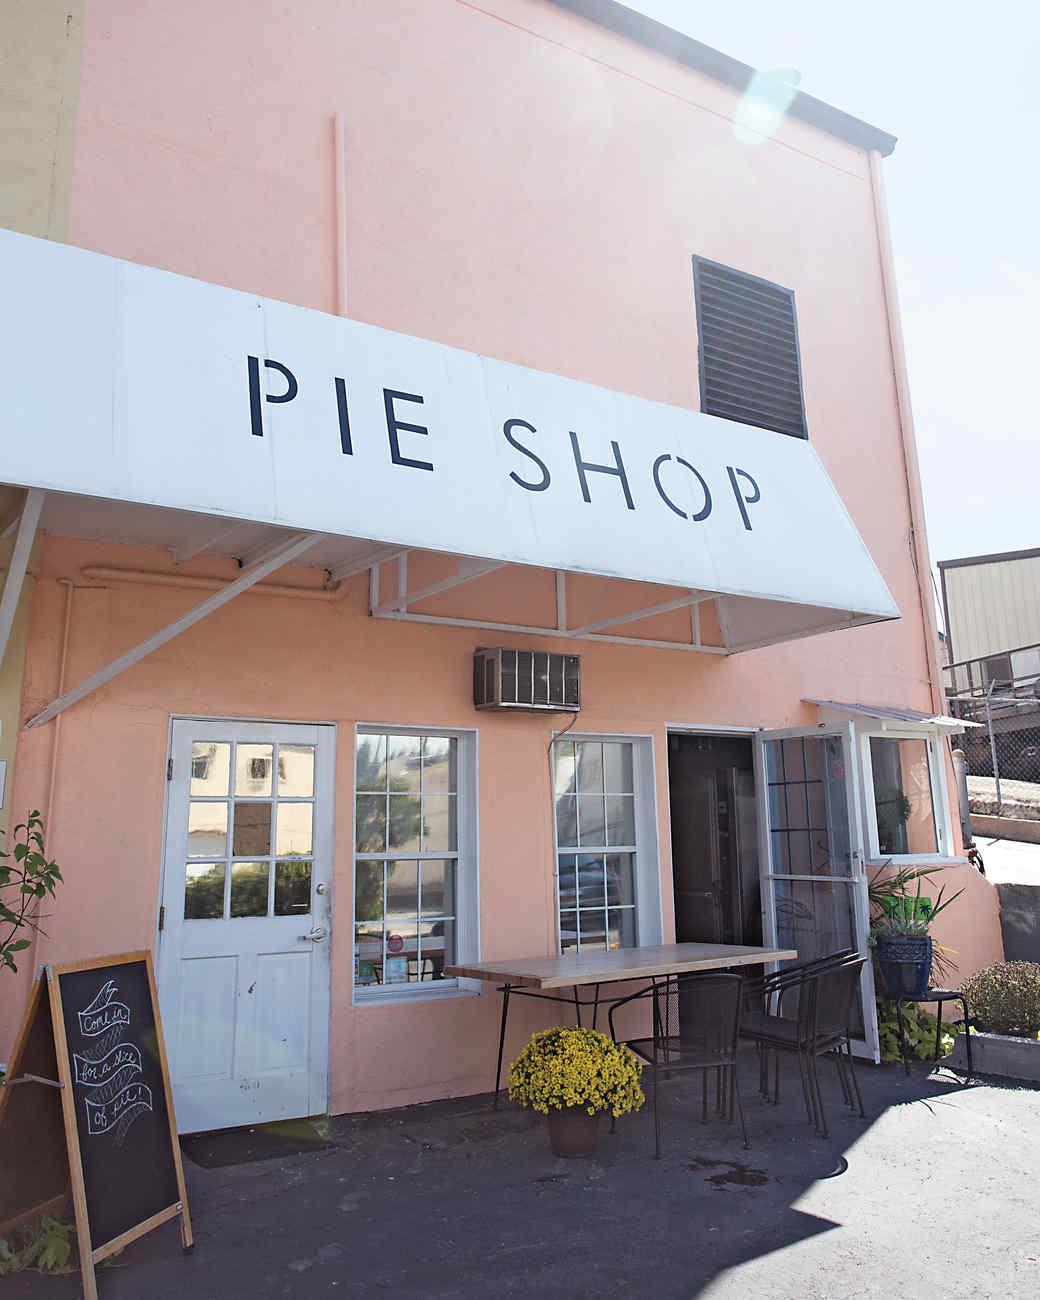 pie-shop-buckhead-village-md109491.jpg